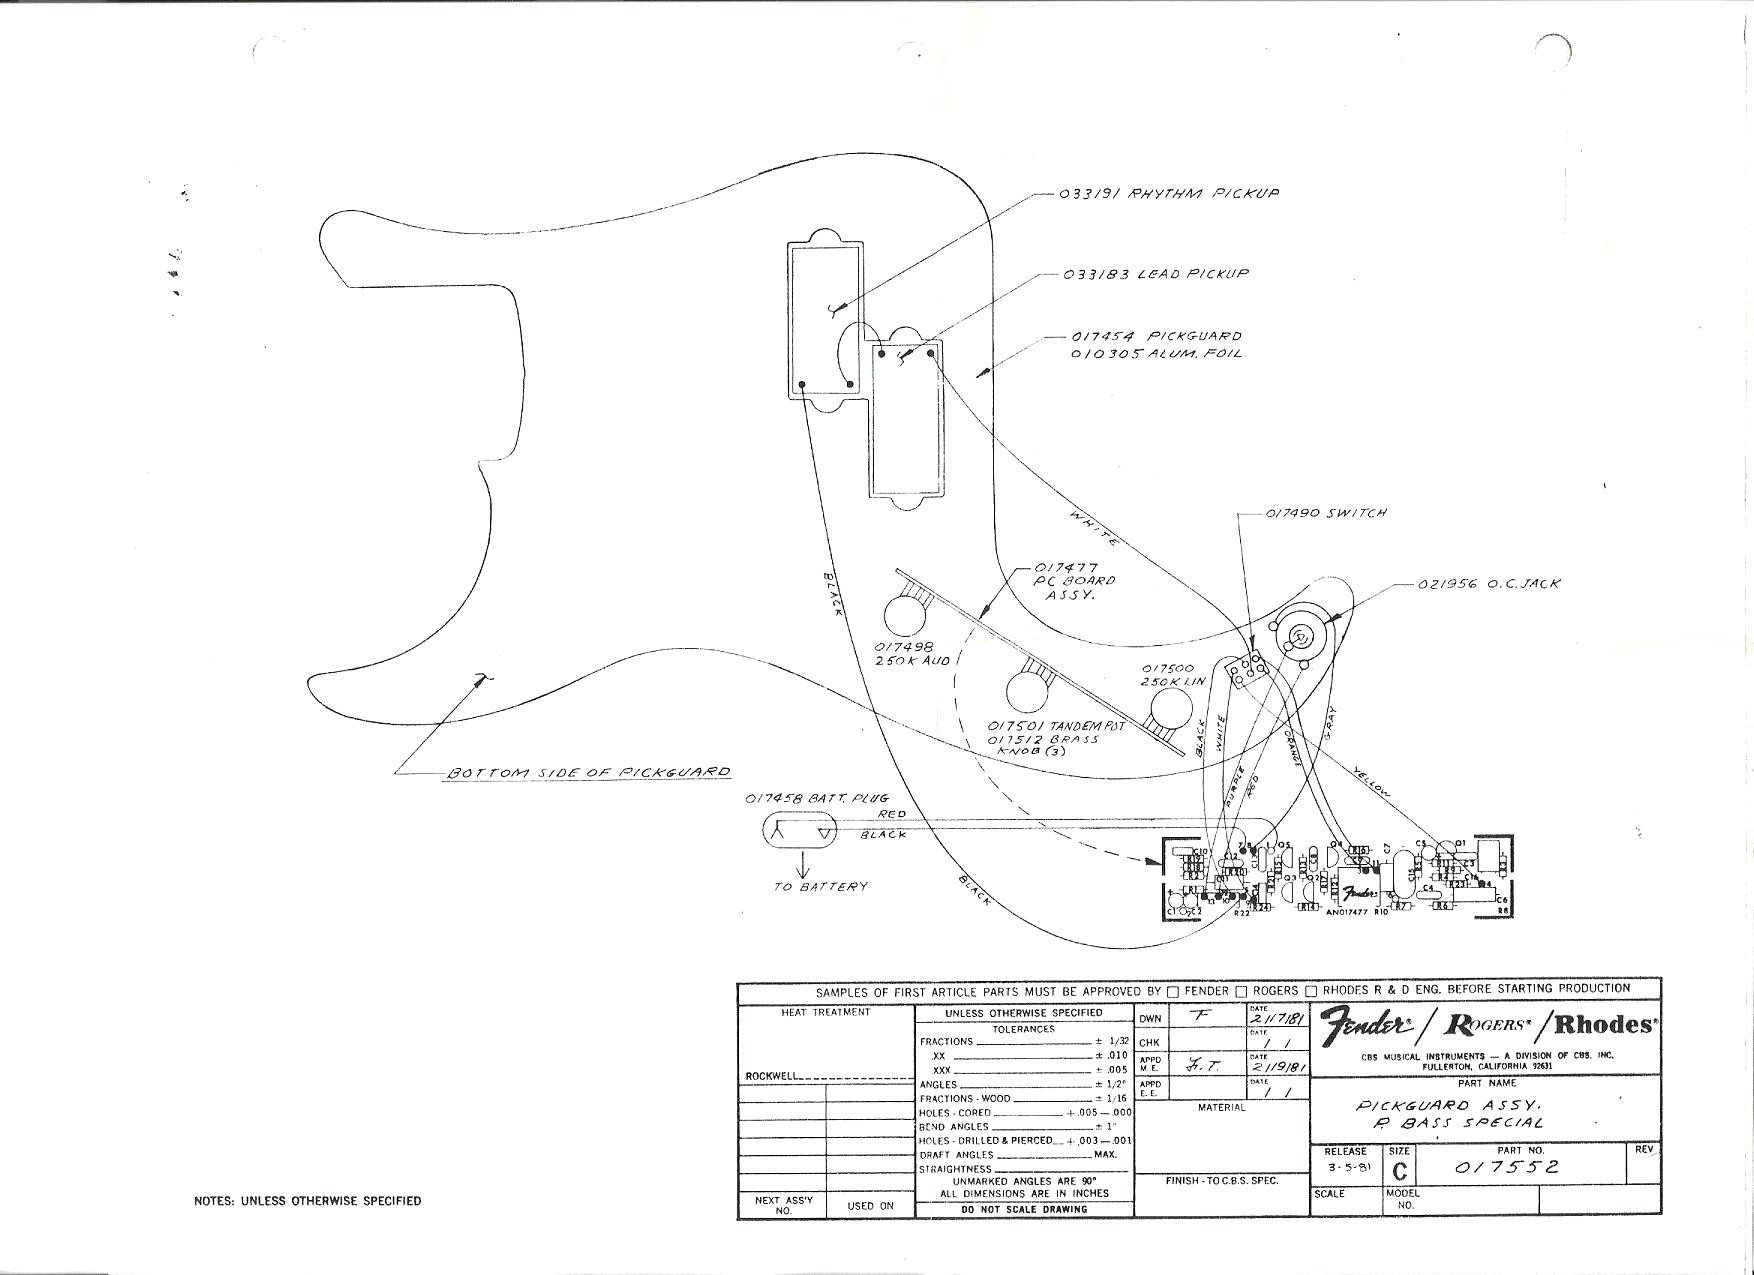 Fender precision bass wiring diagram my wiring diagram knob and tube wiring diagram elegant fender precision bass wiring asfbconference2016 Gallery